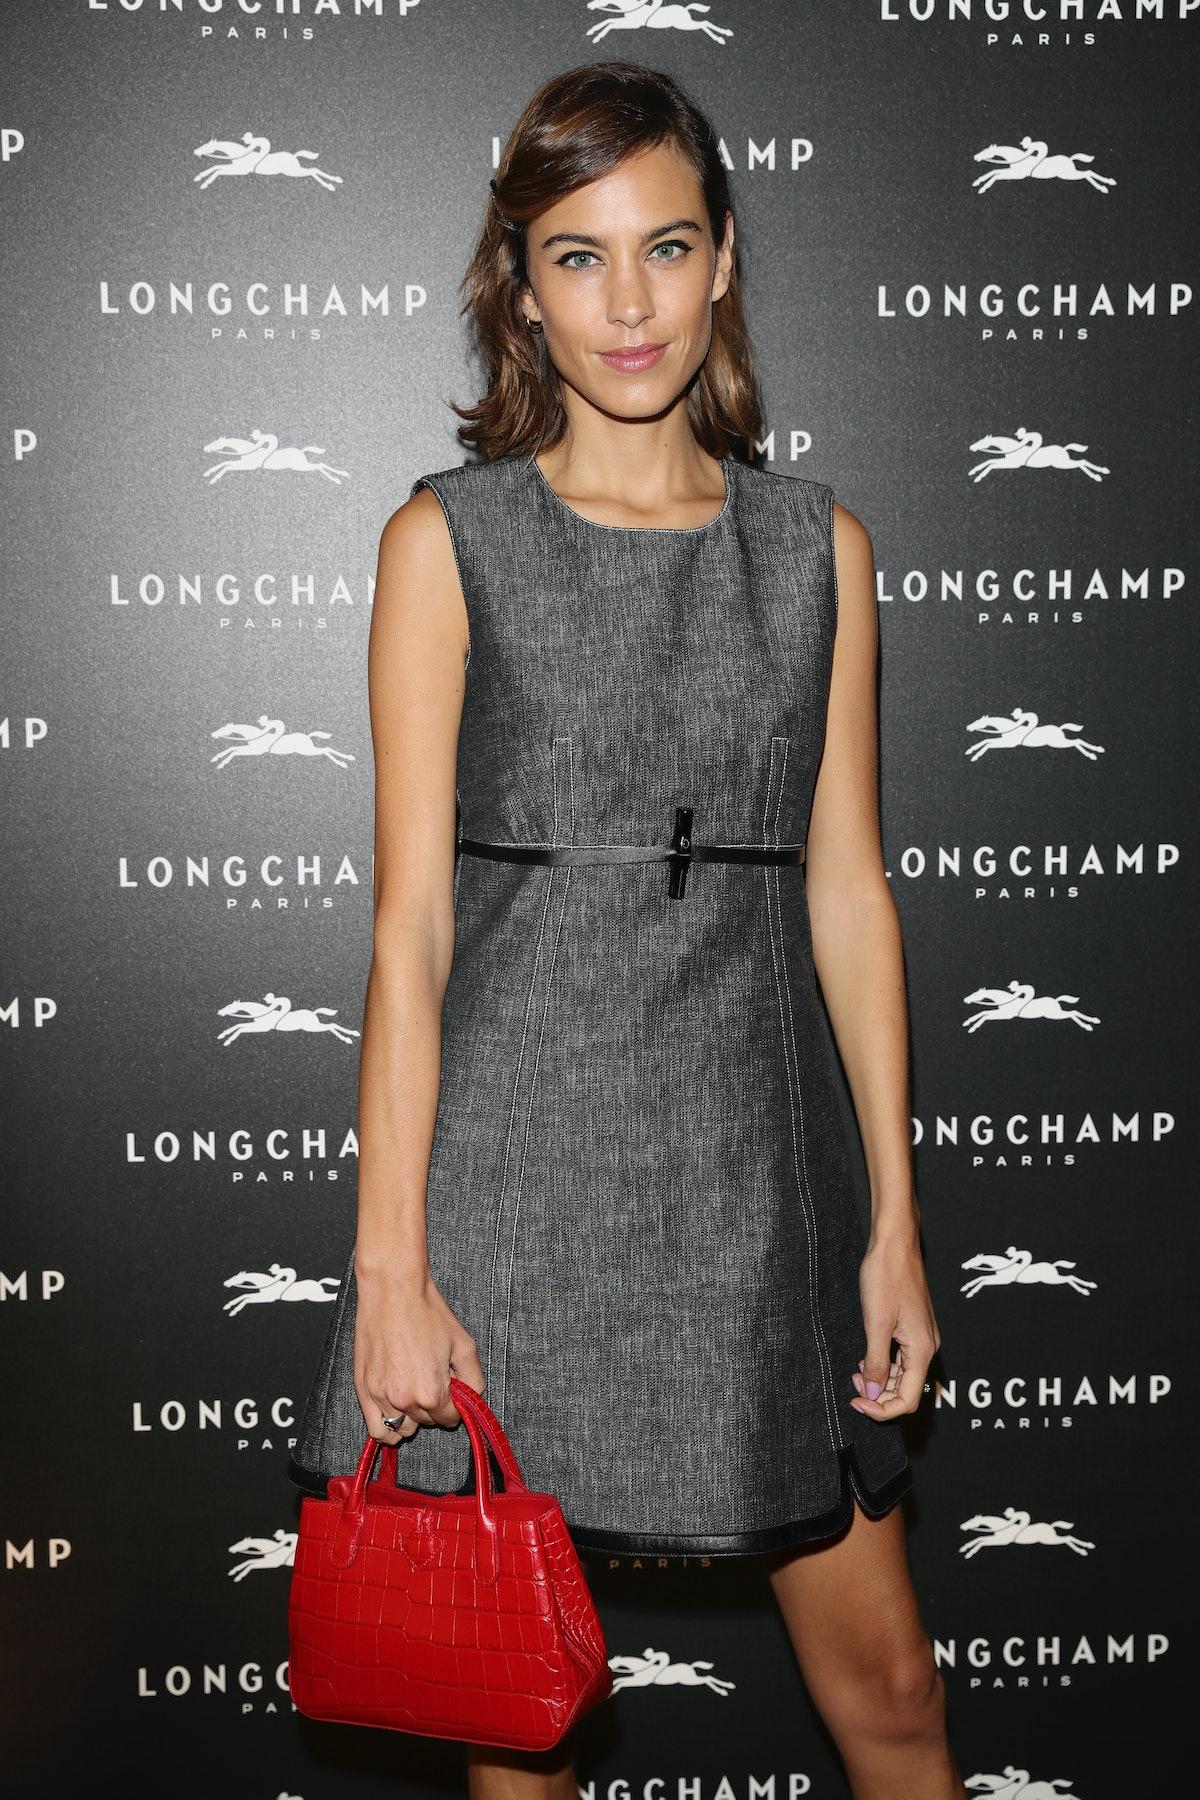 Longchamp_October4th2016_AlexaChung.JPG